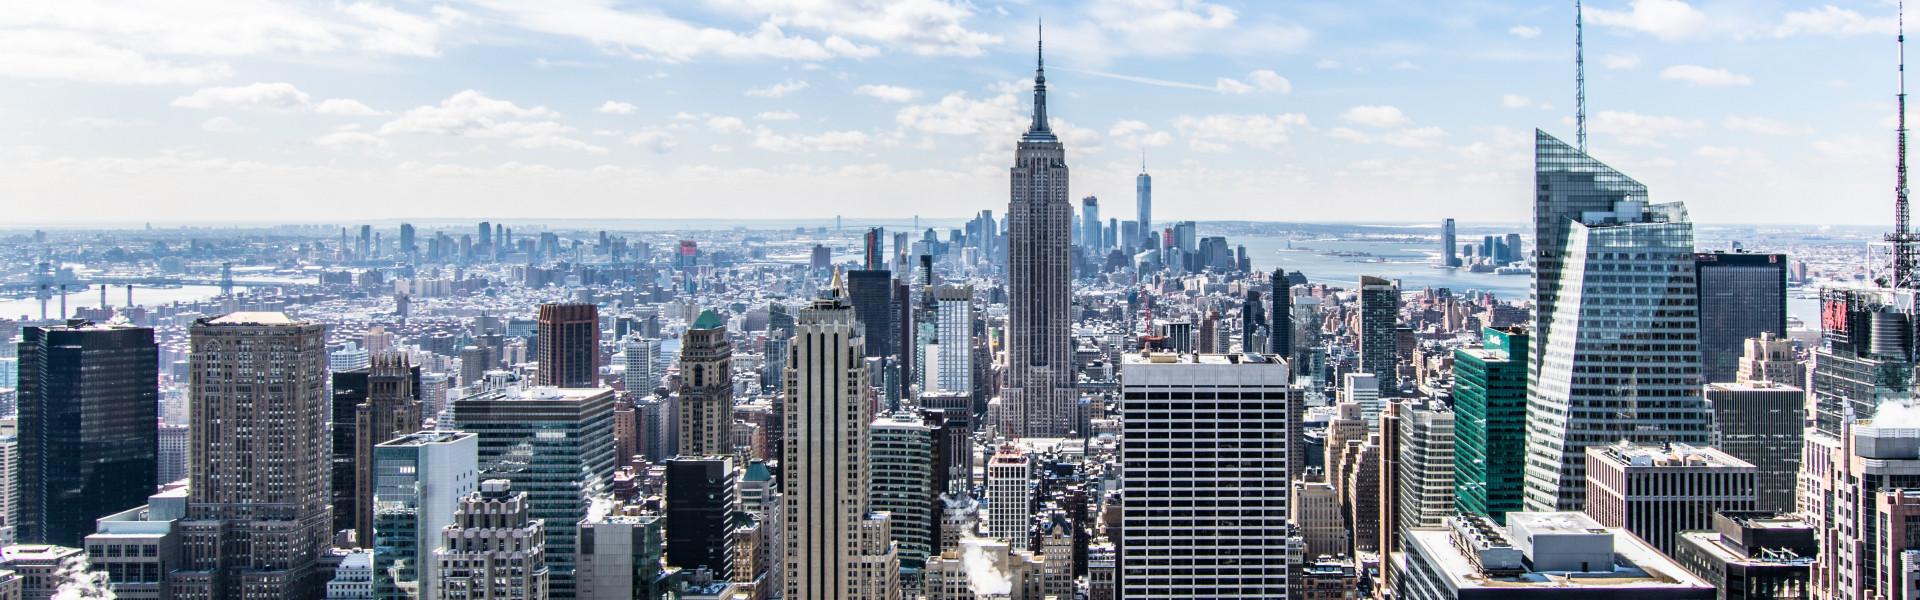 Destination image of New York City